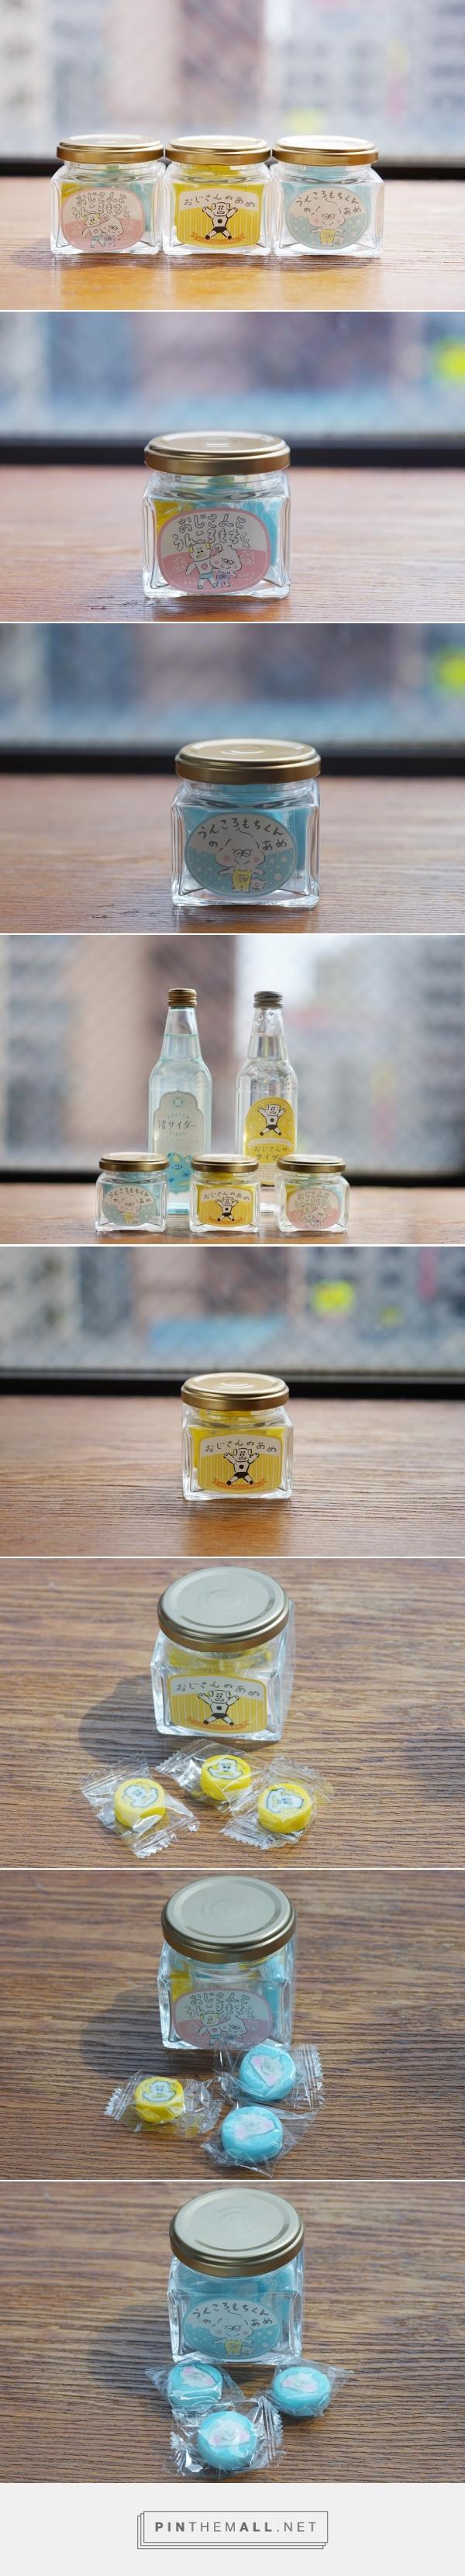 Ojisan no Cider - Packaging of the World - Creative Package Design Gallery - http://www.packagingoftheworld.com/2016/04/ojisan-no-cider.html